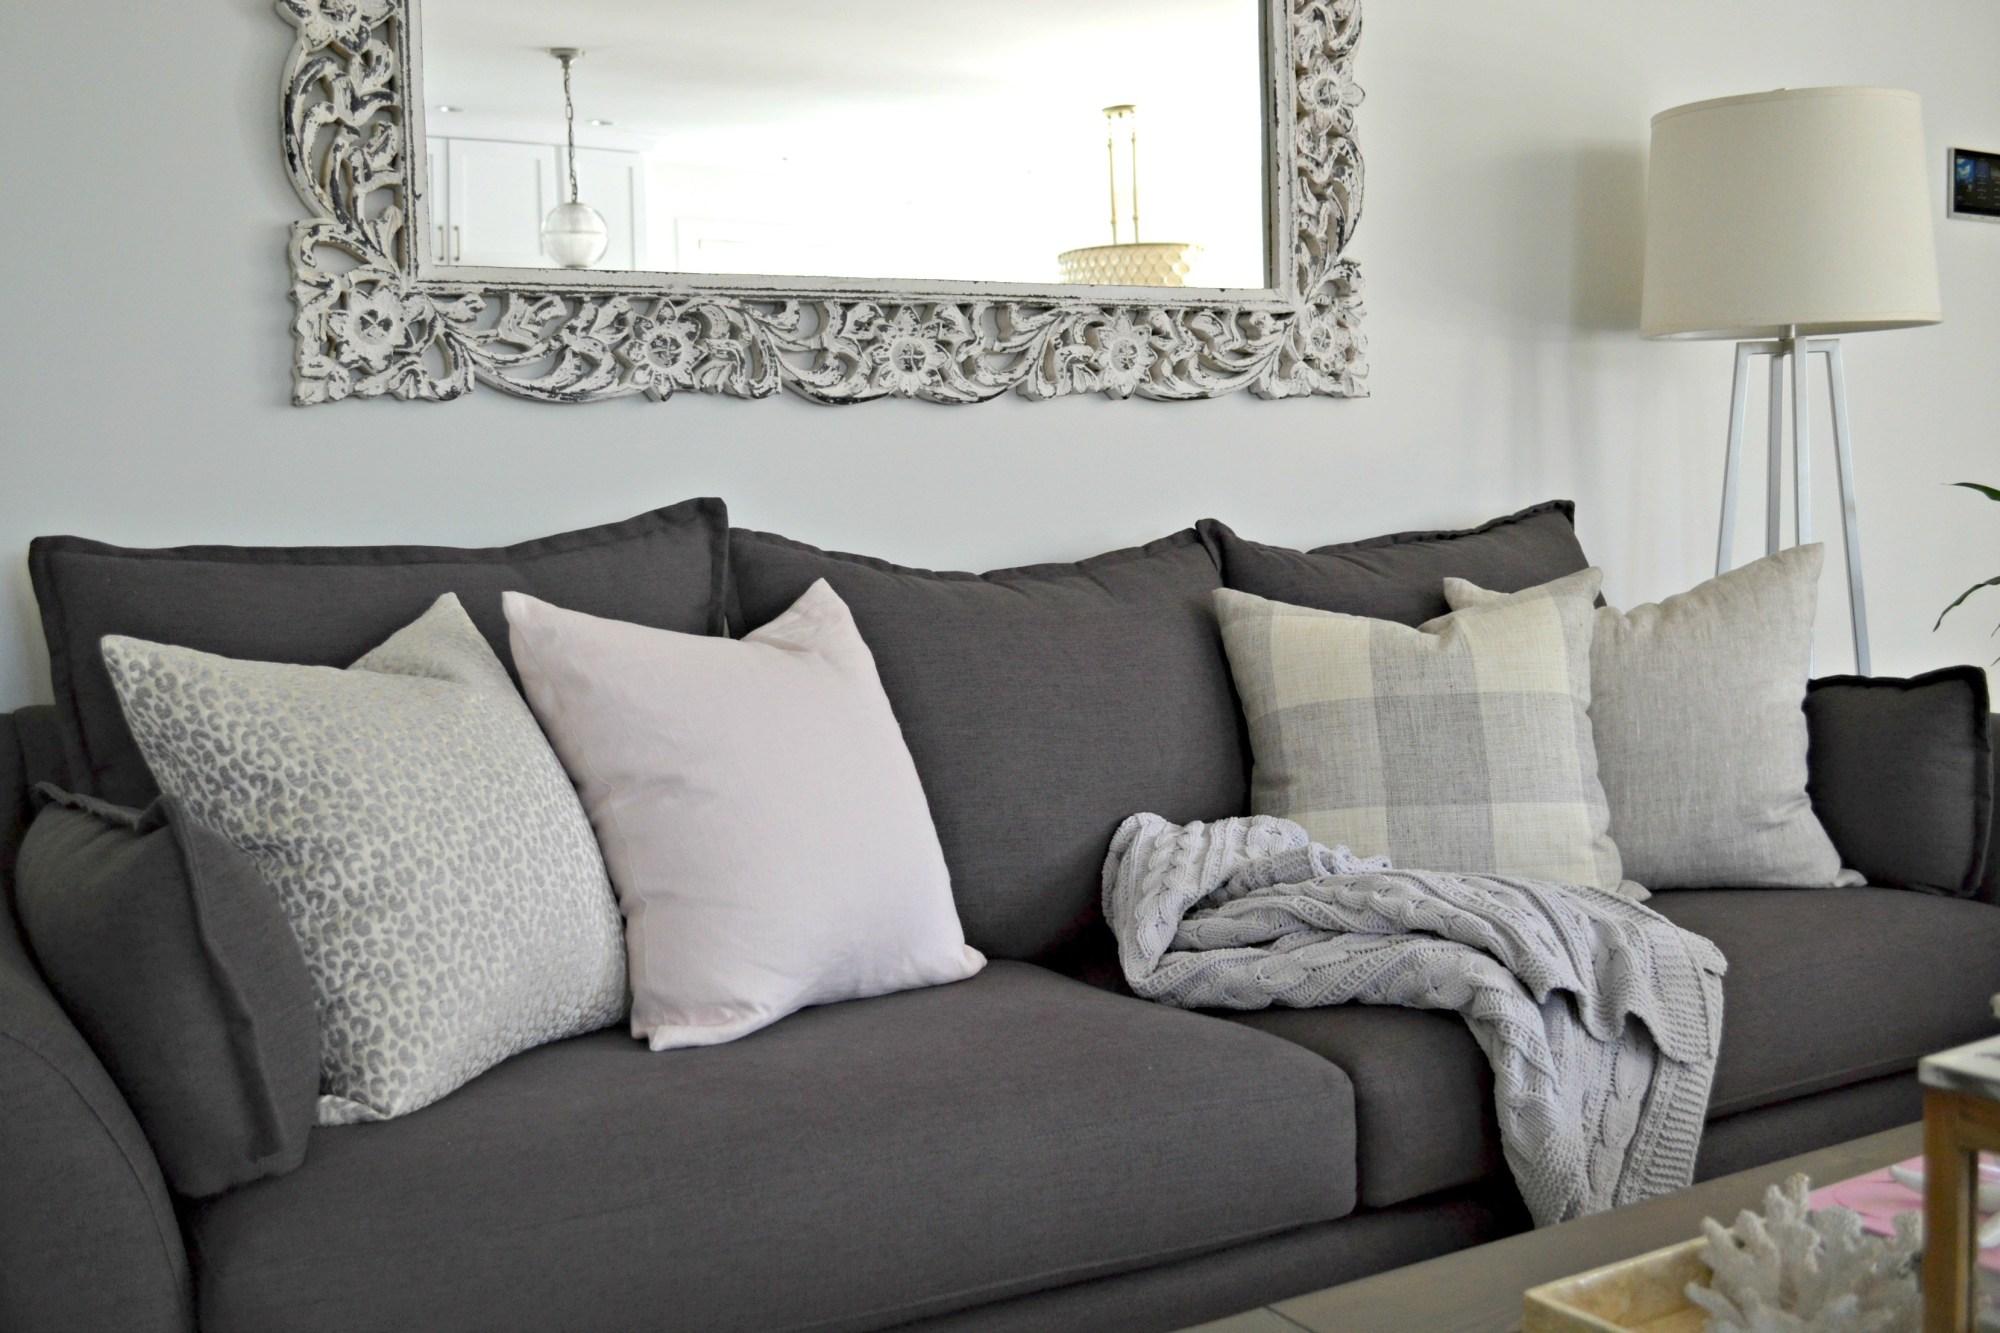 Pillows-couch-2.jpg